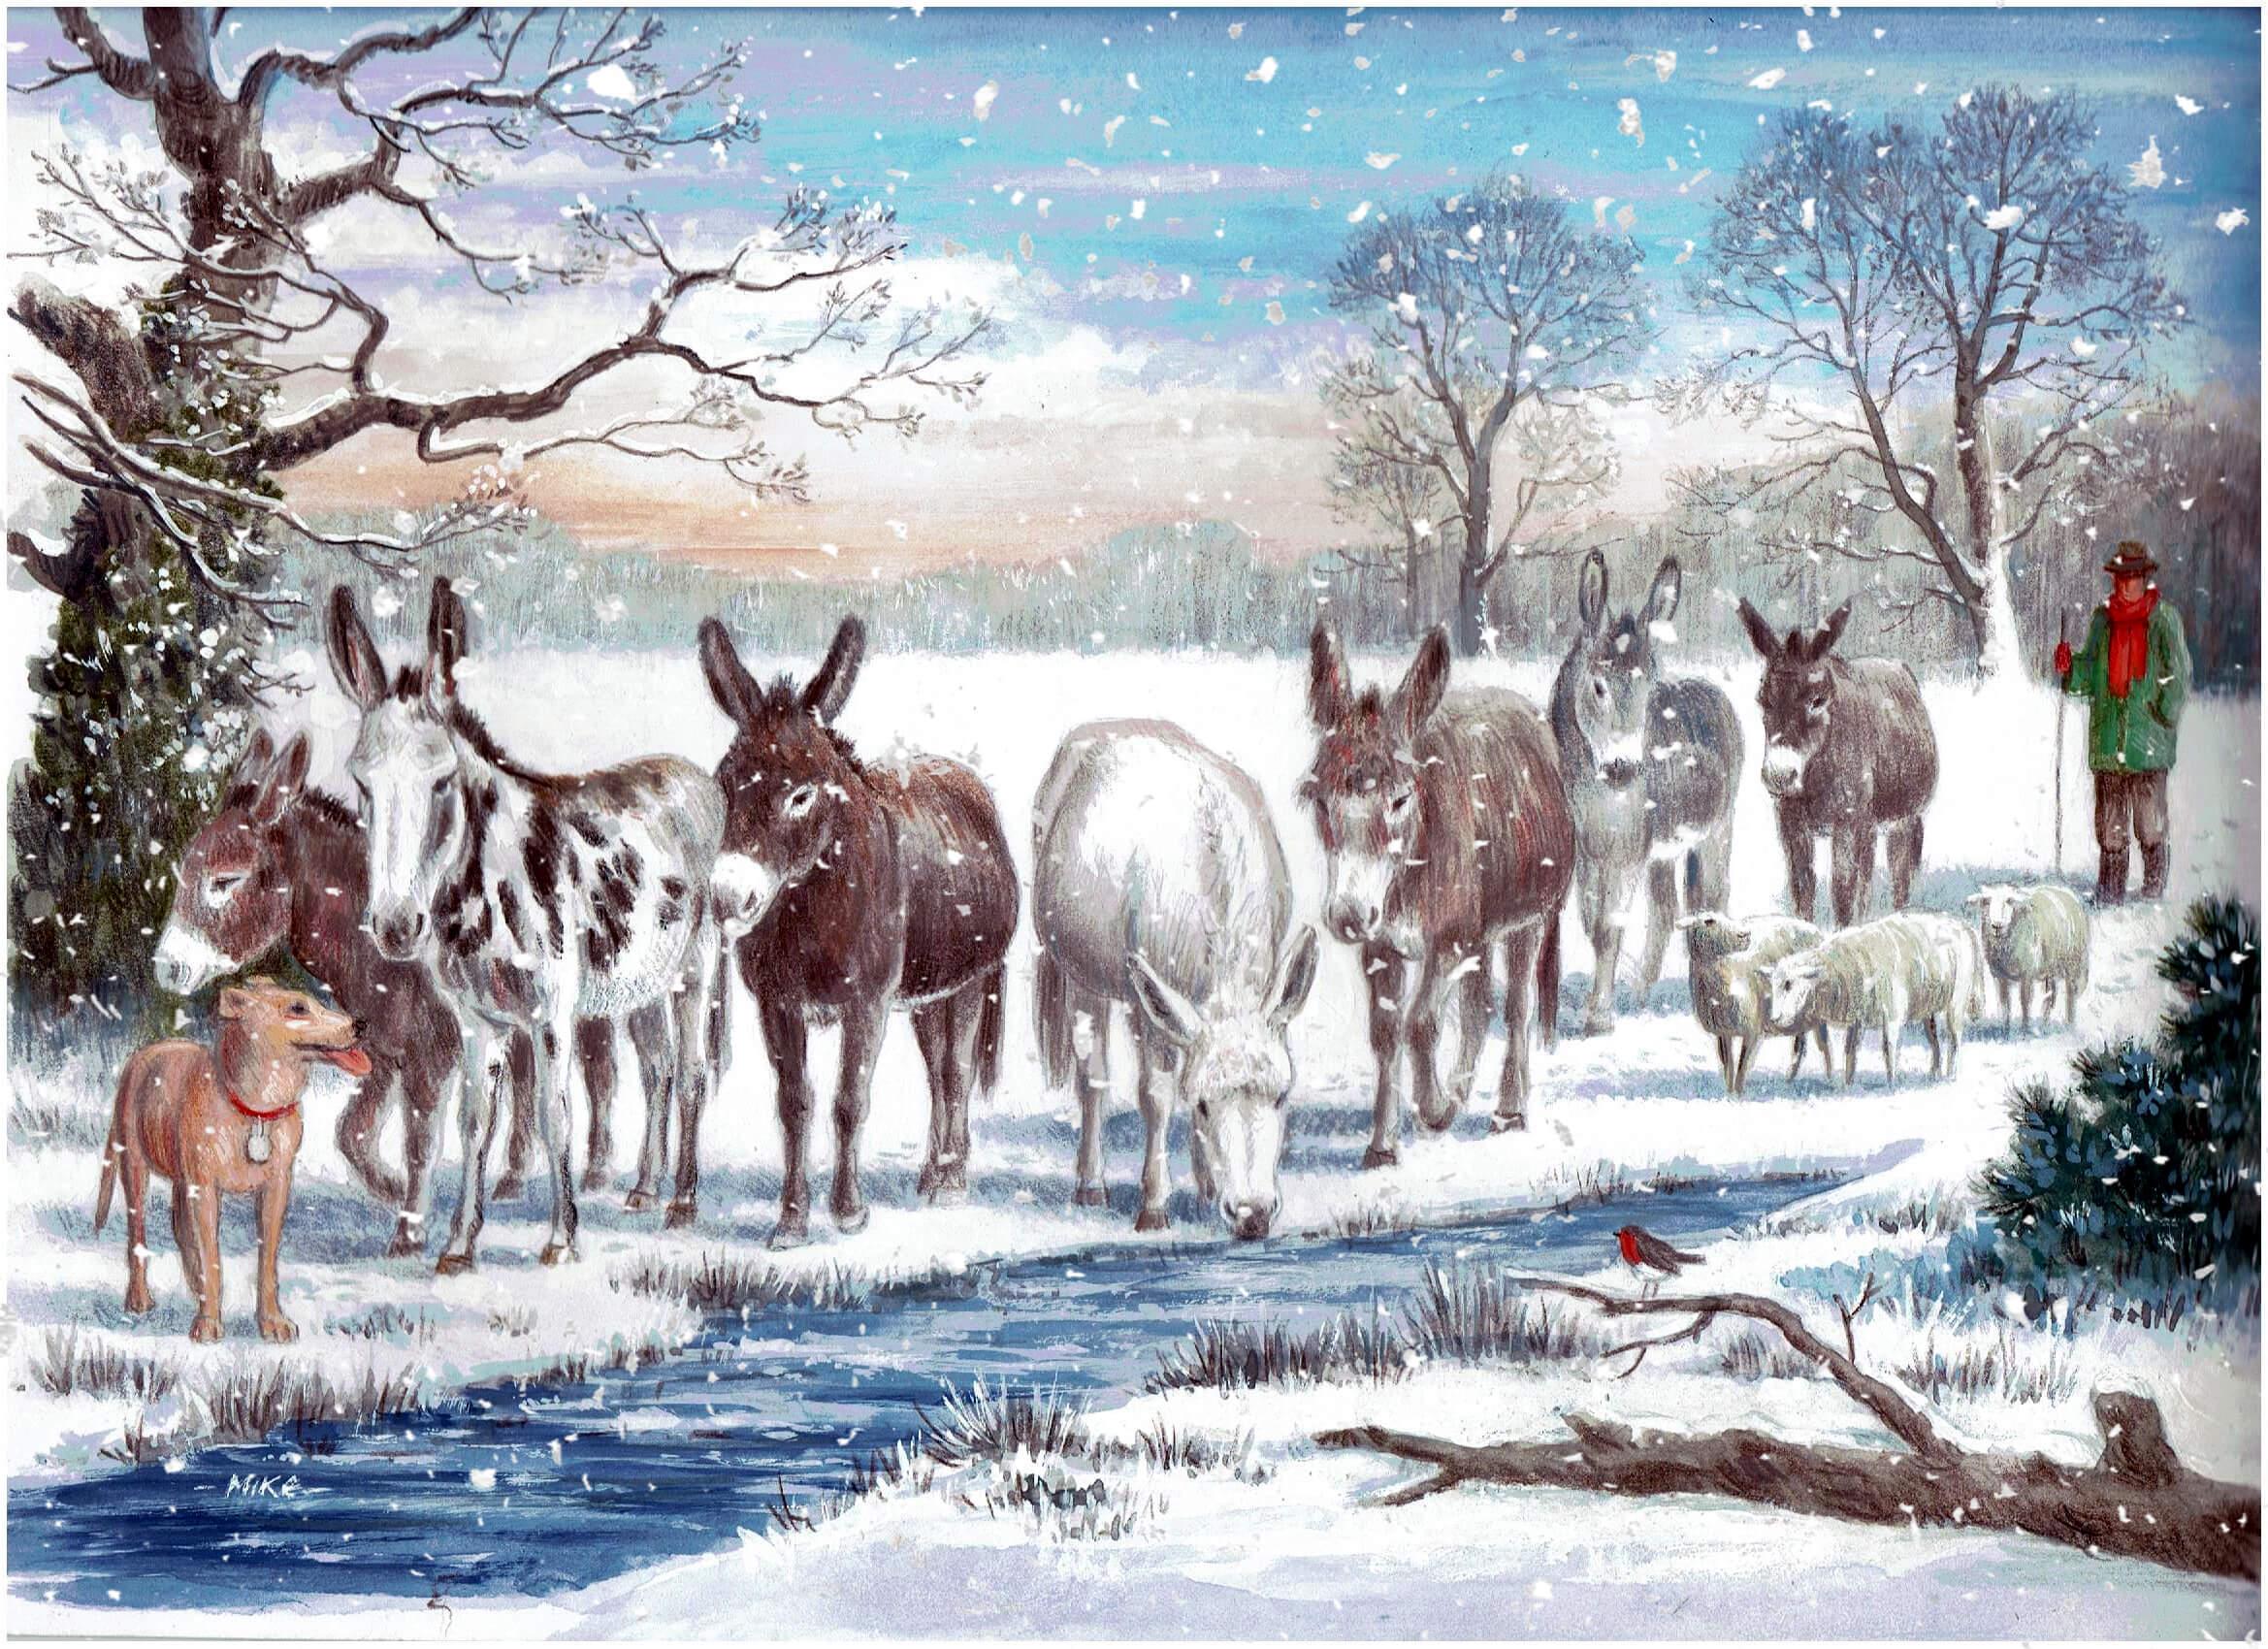 Christmas Gift Shop Now Open - Remus Horse Sanctuary